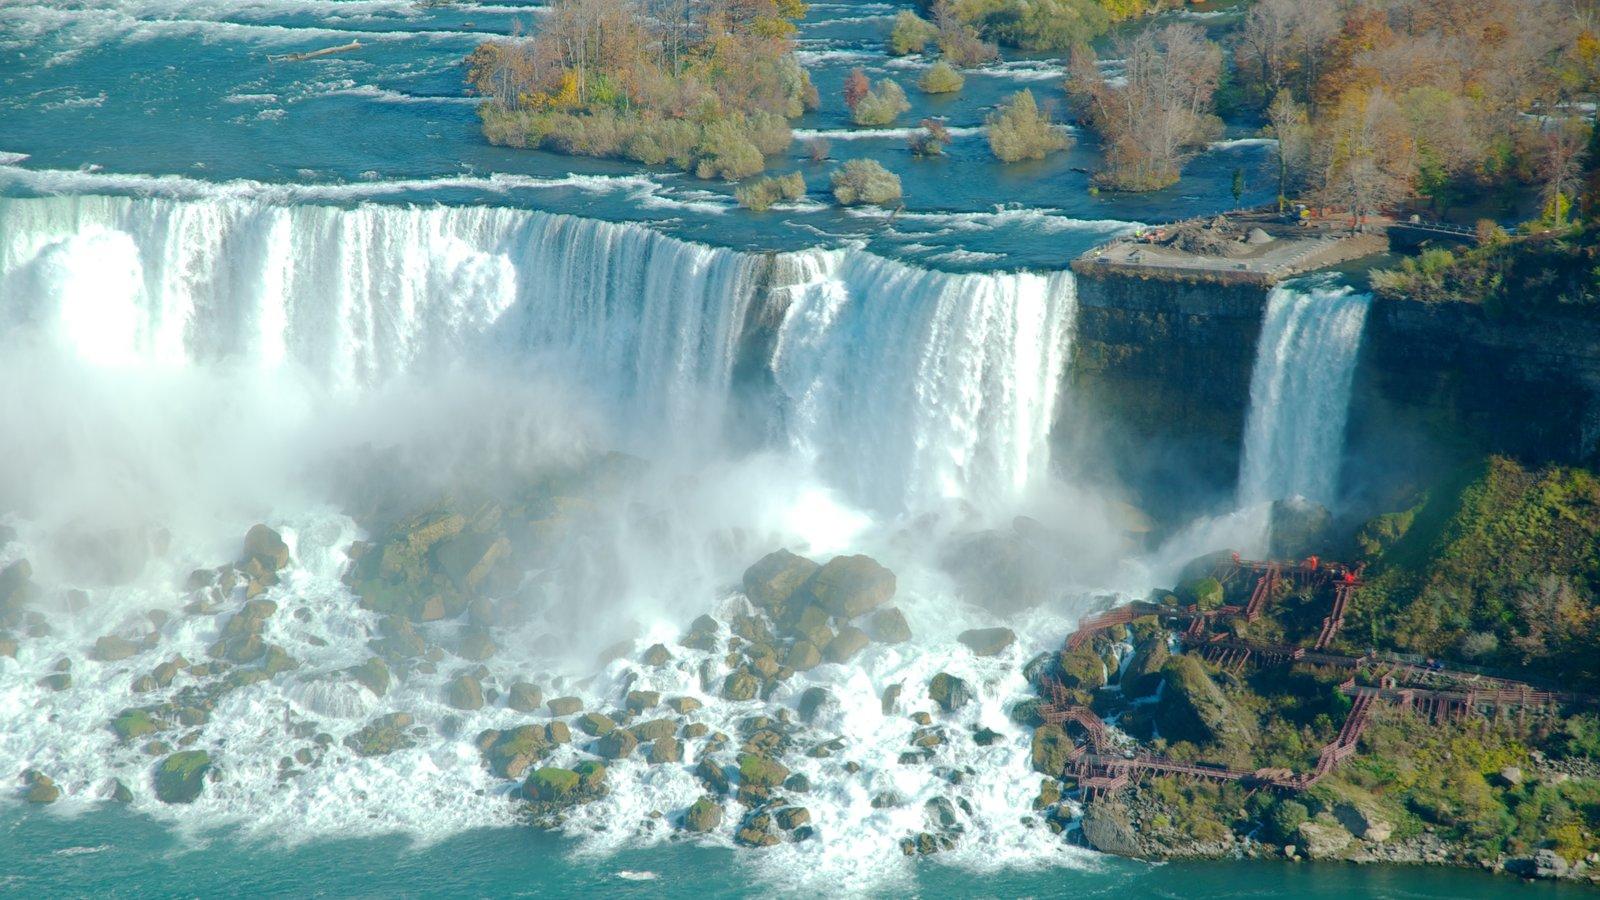 Bridal Veil Falls caracterizando uma cachoeira